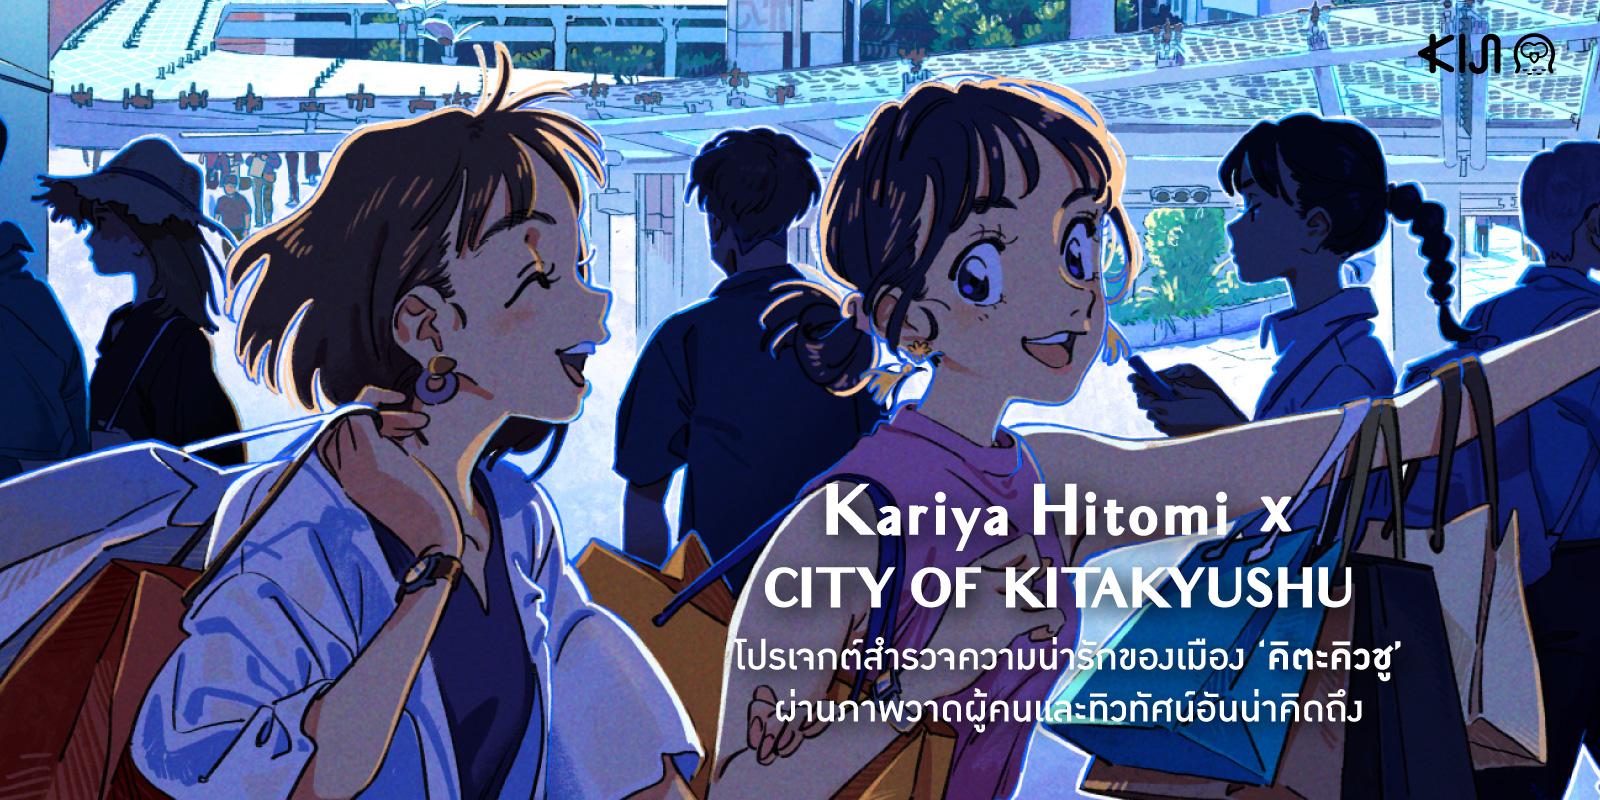 Kariya Hitomi x CITY OF KITAKYUSHU